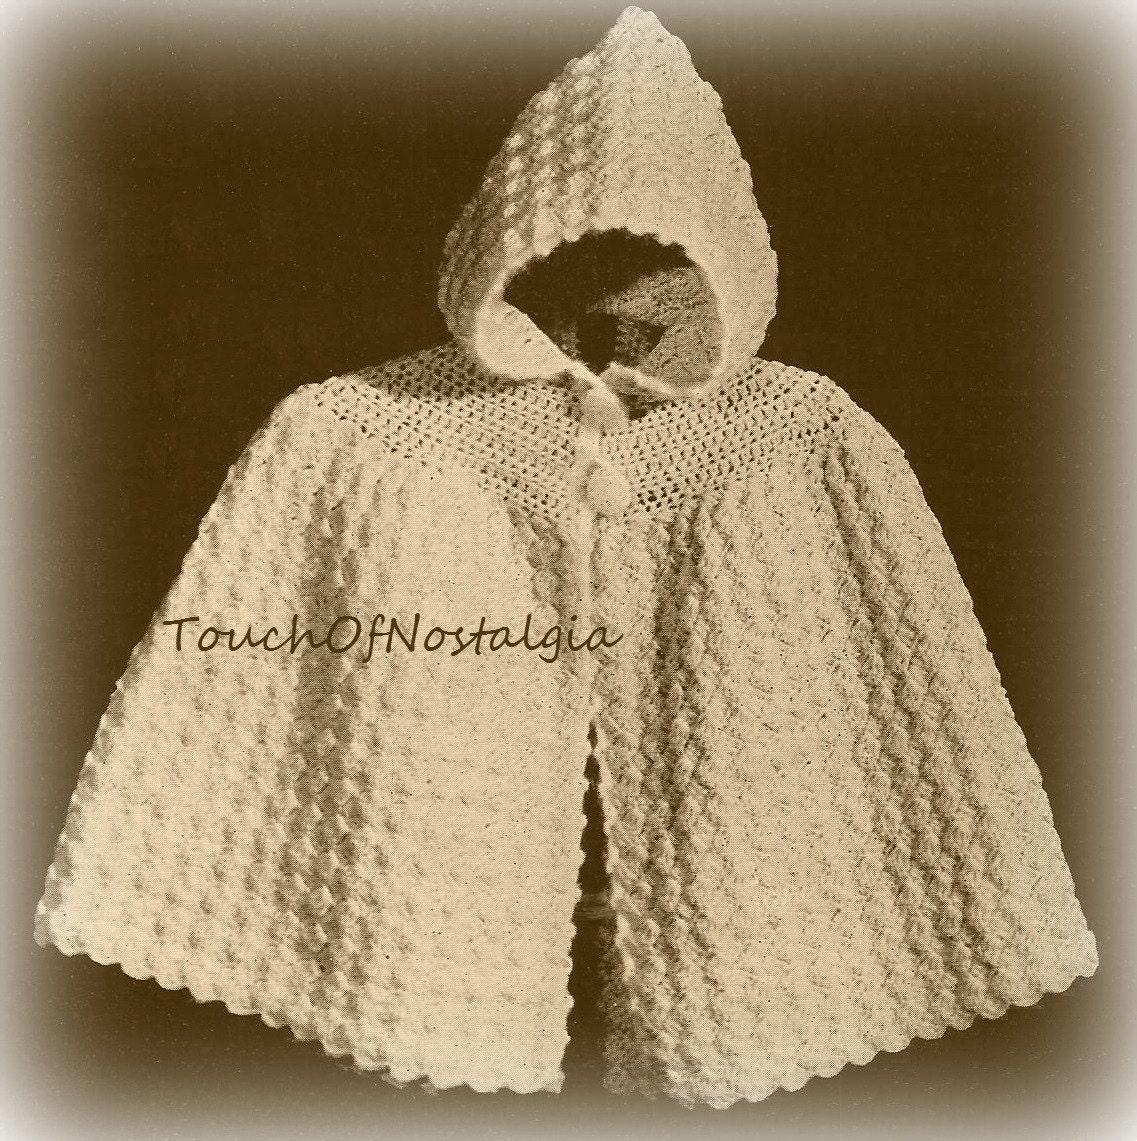 Knitting Pattern For A Little Girl s Cape : Crochet Baby HOODED CAPE vintage Crochet Pattern Cuddly